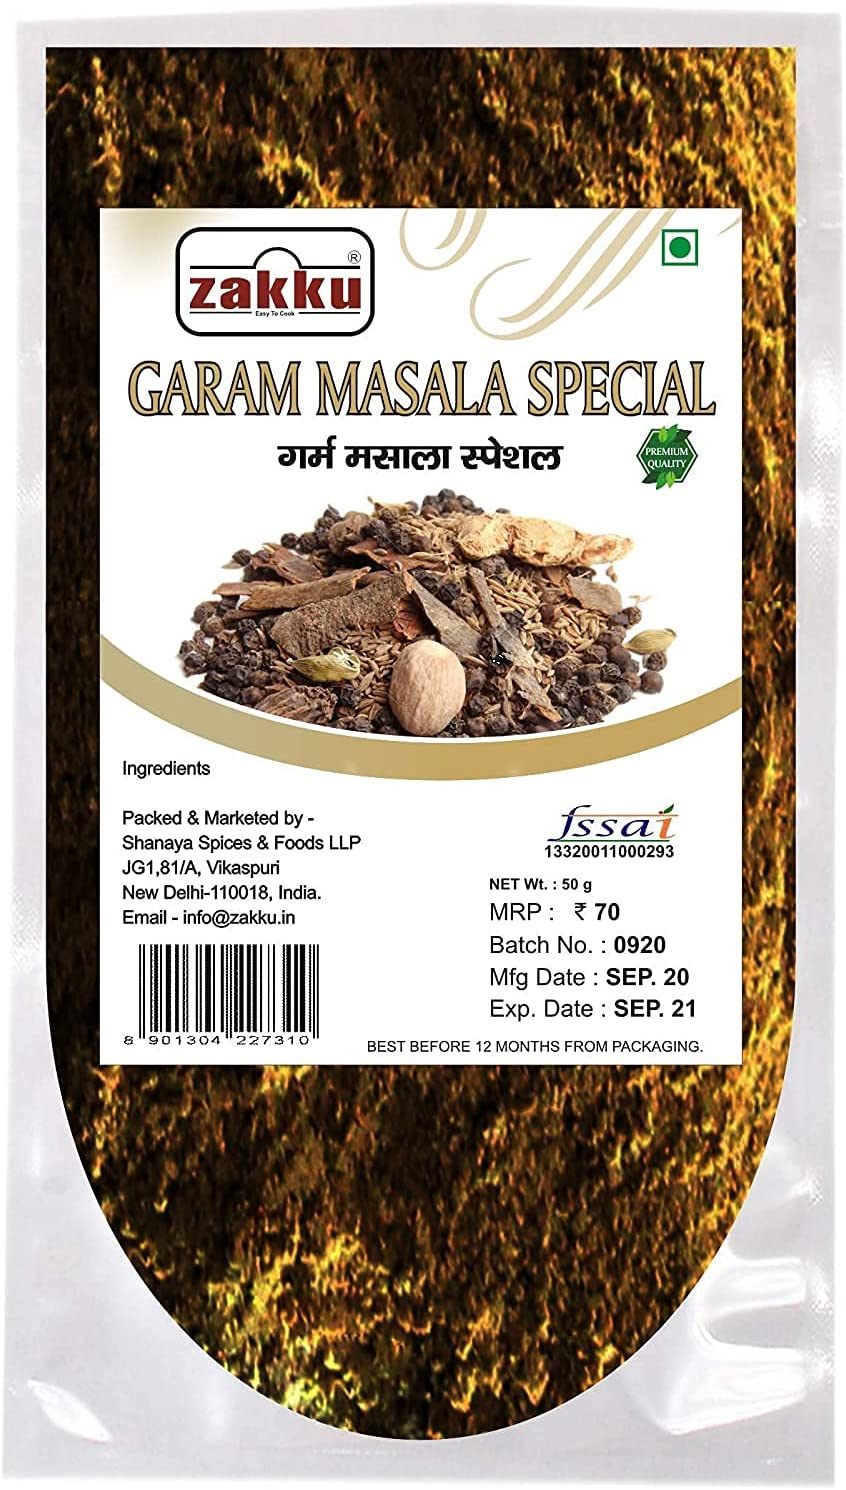 Jexmon ZAKKU Garam Masala Quantity limited Blended Spices Special 2021 new